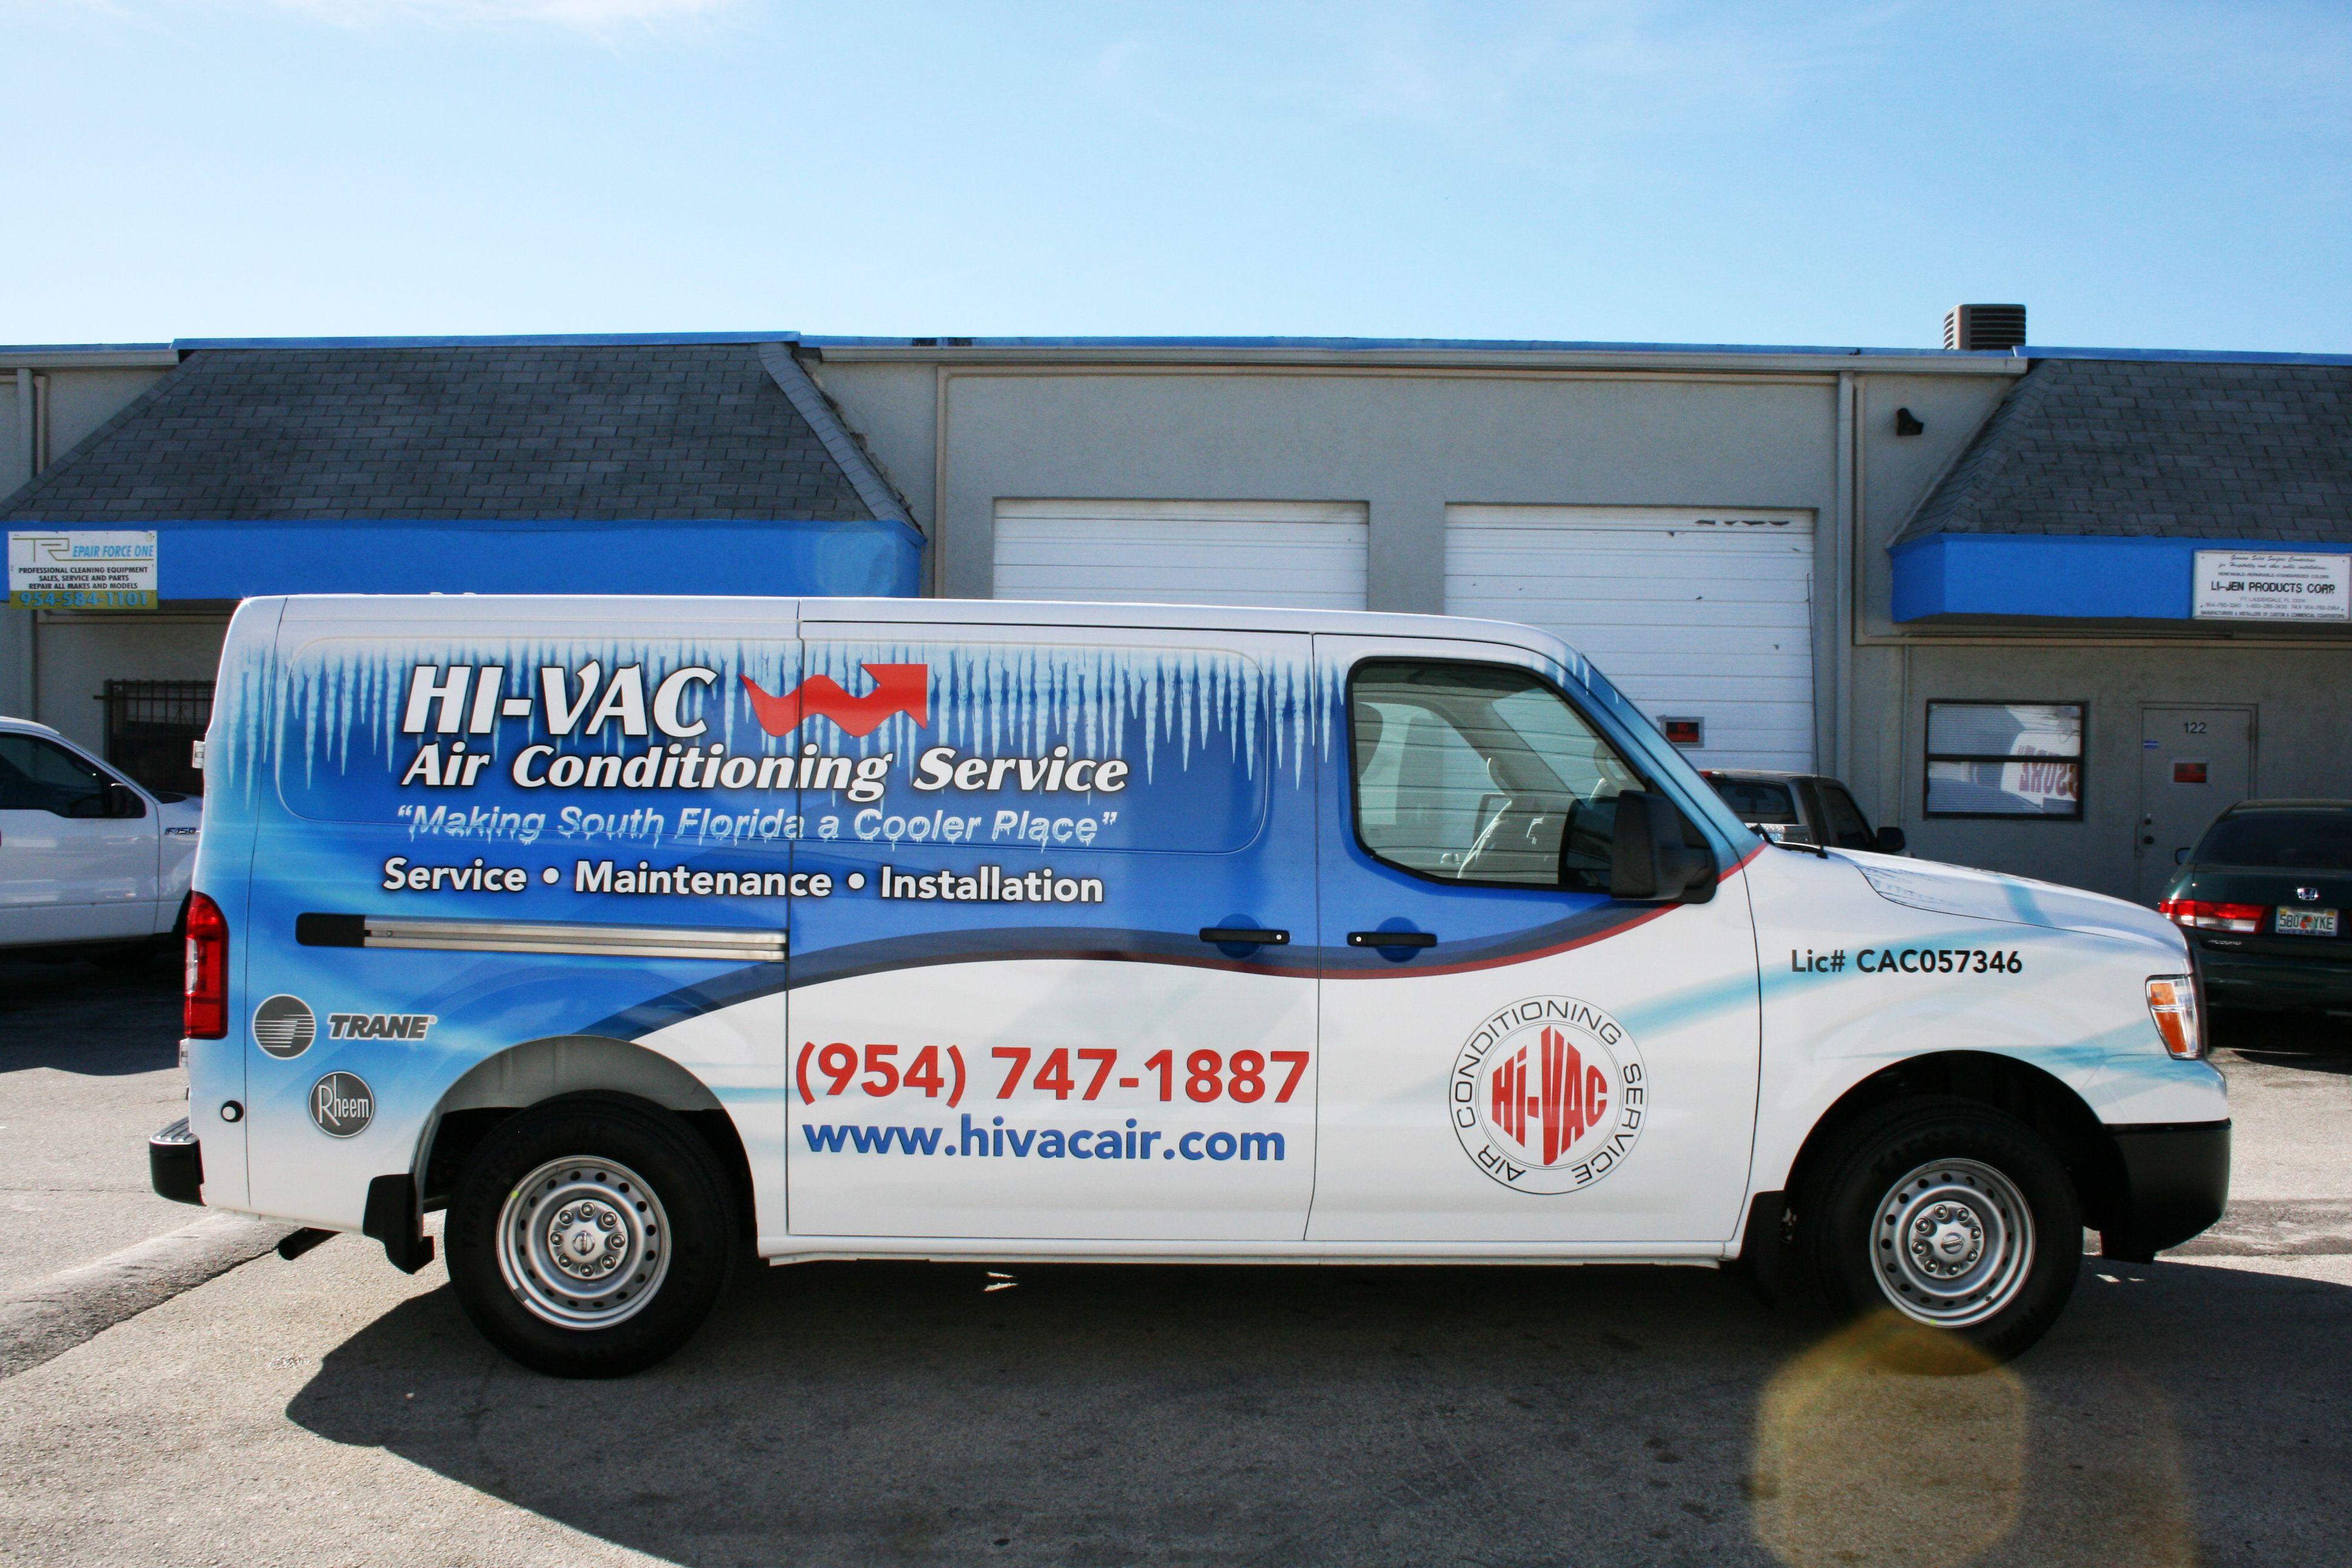 Nissan Nv1500 Cargo Van 3m Vinyl Vehicle Wrap Fort Lauderdale